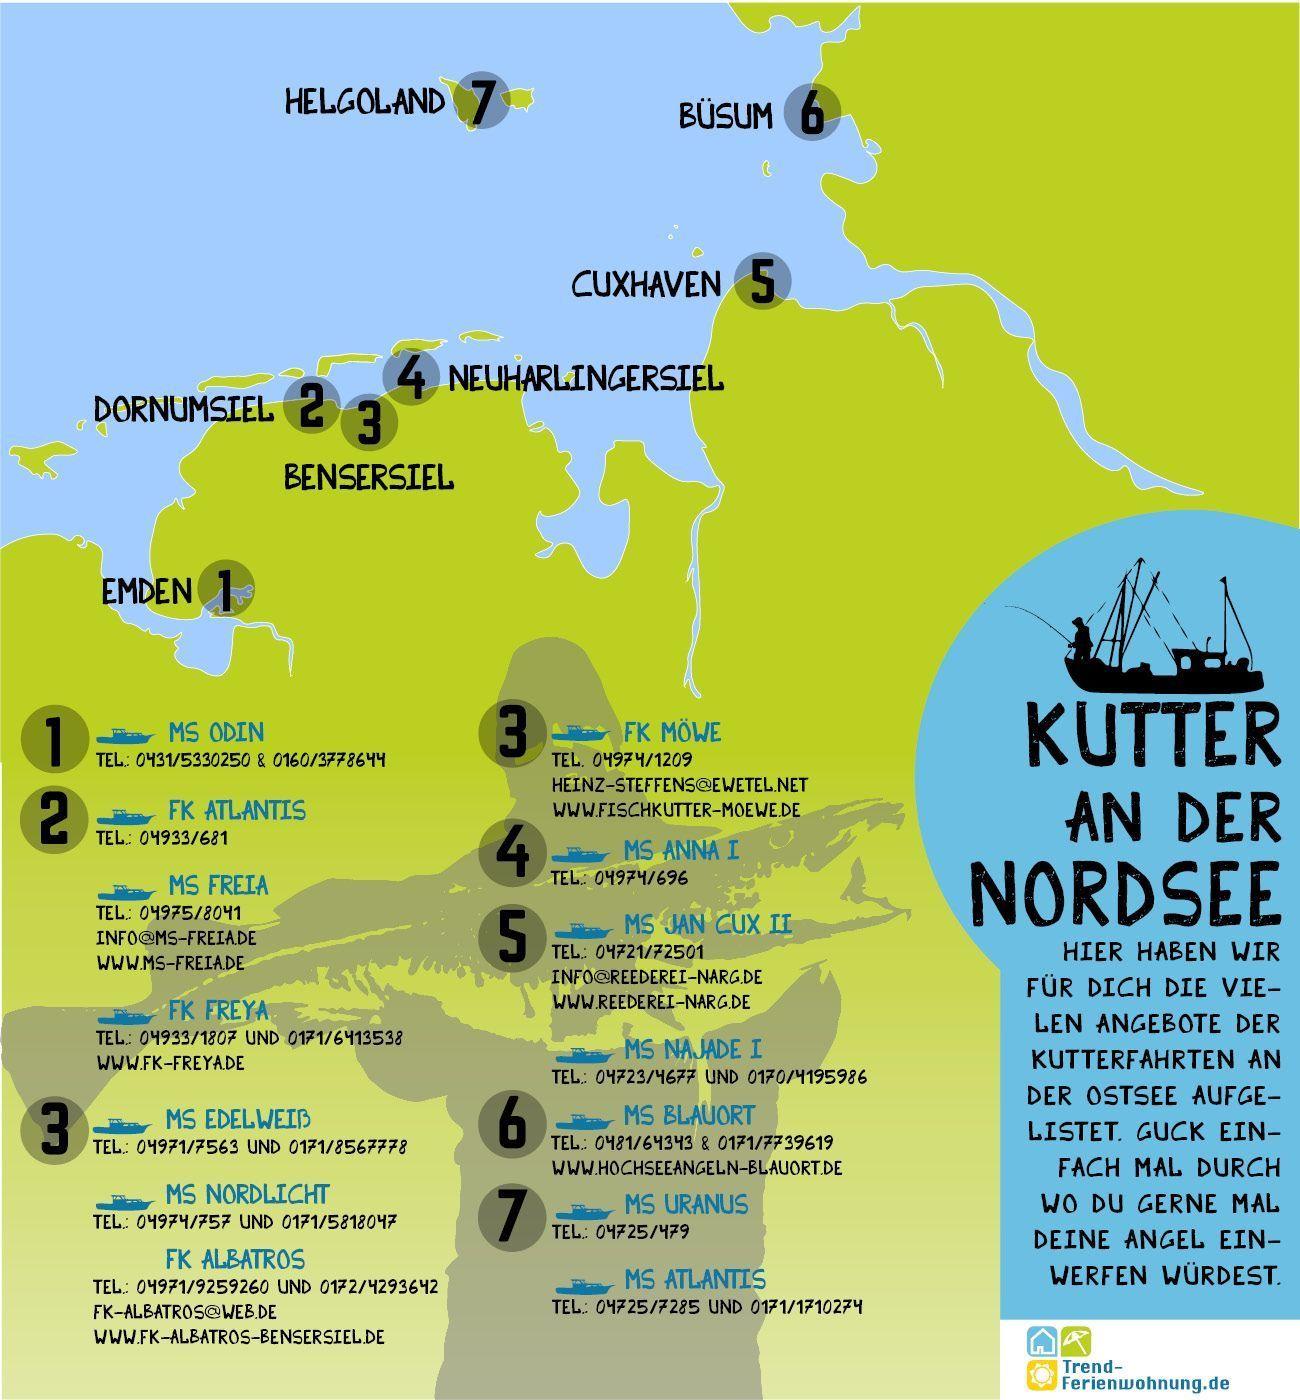 Angelkutter an der Nordsee